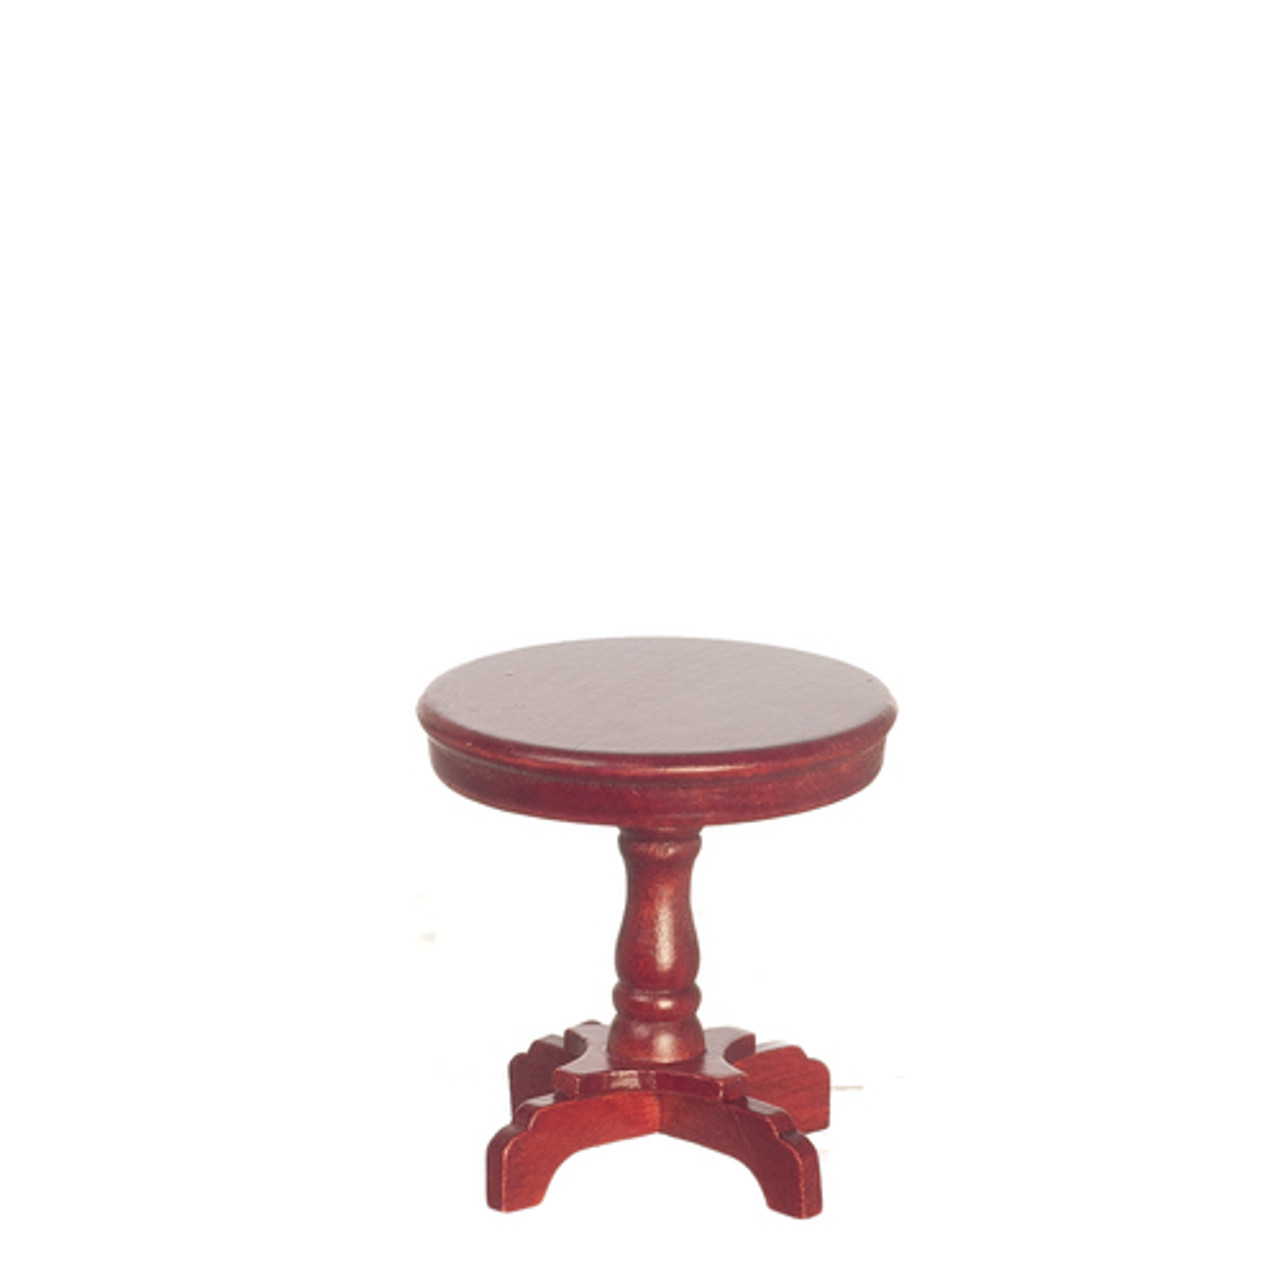 Victorian Pedestal End Table - Mahogany